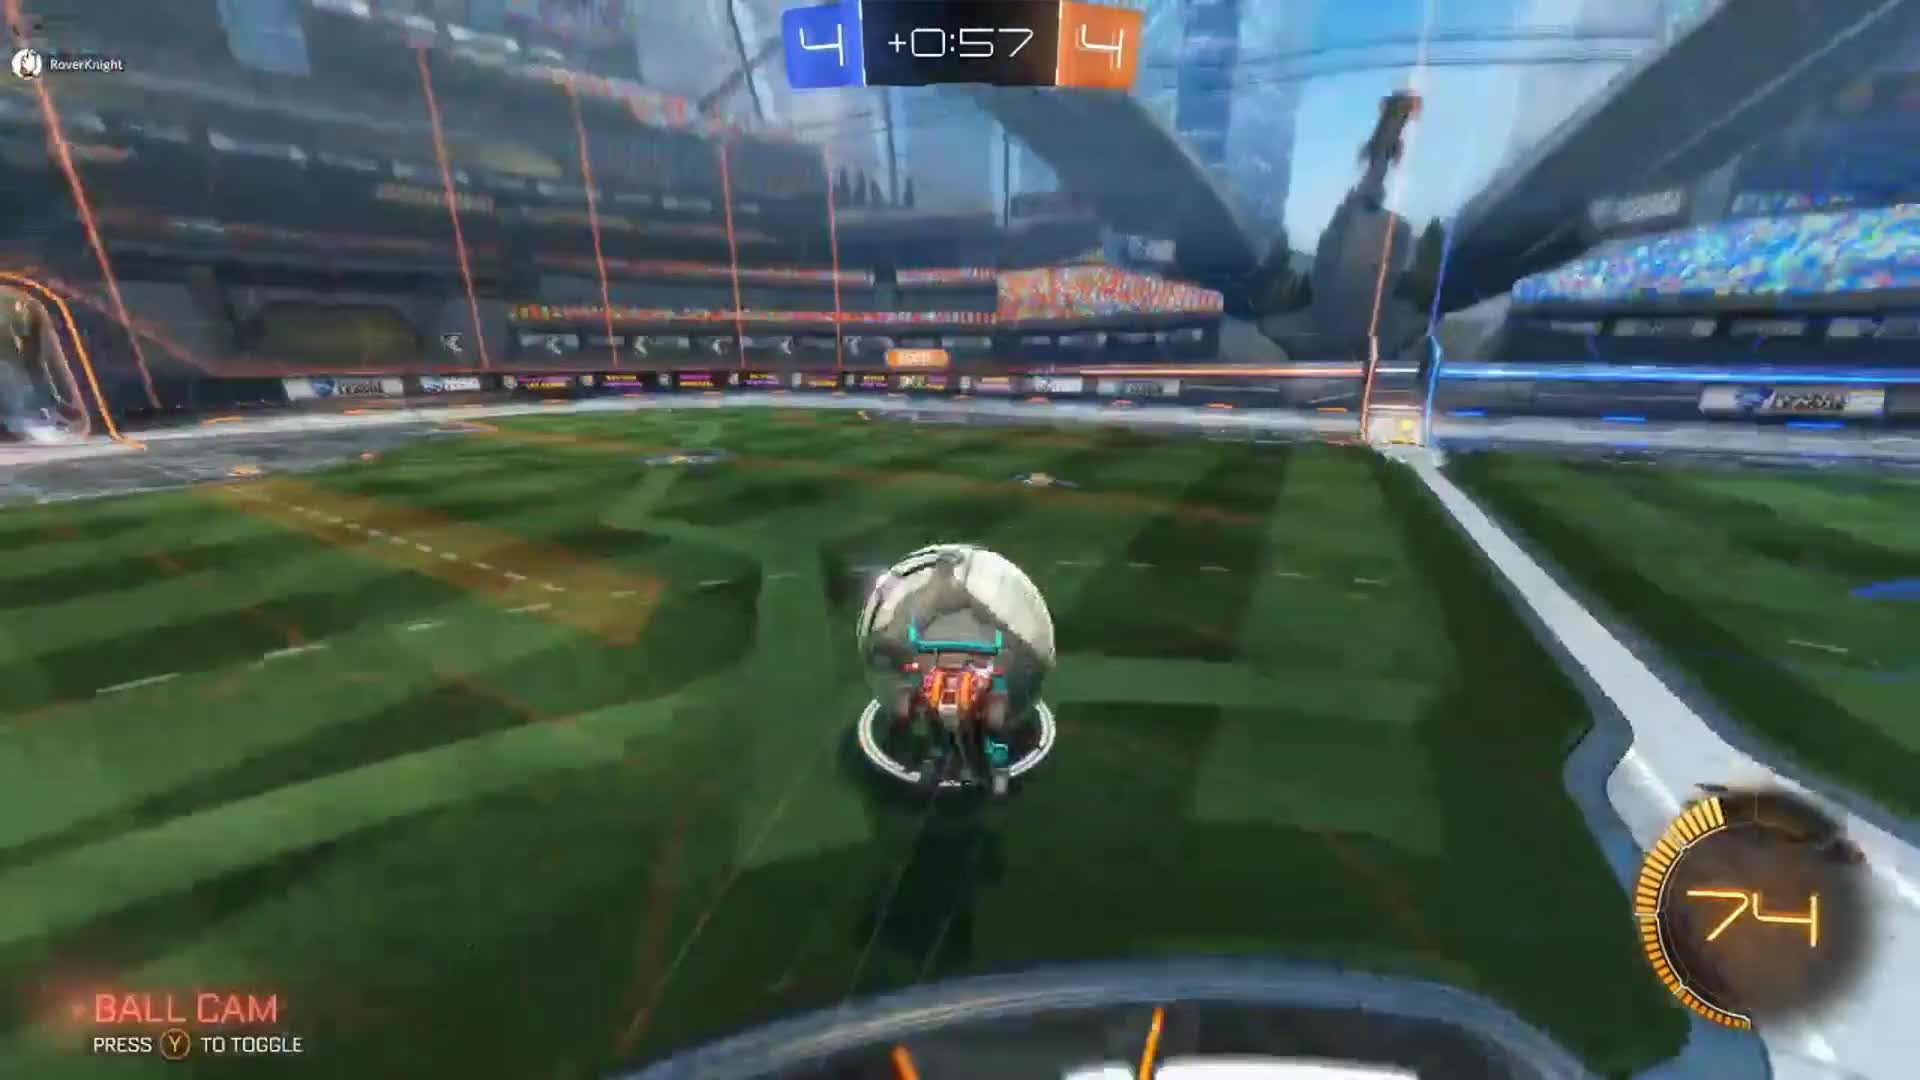 RocketLeague, Gif Your Game GIFs